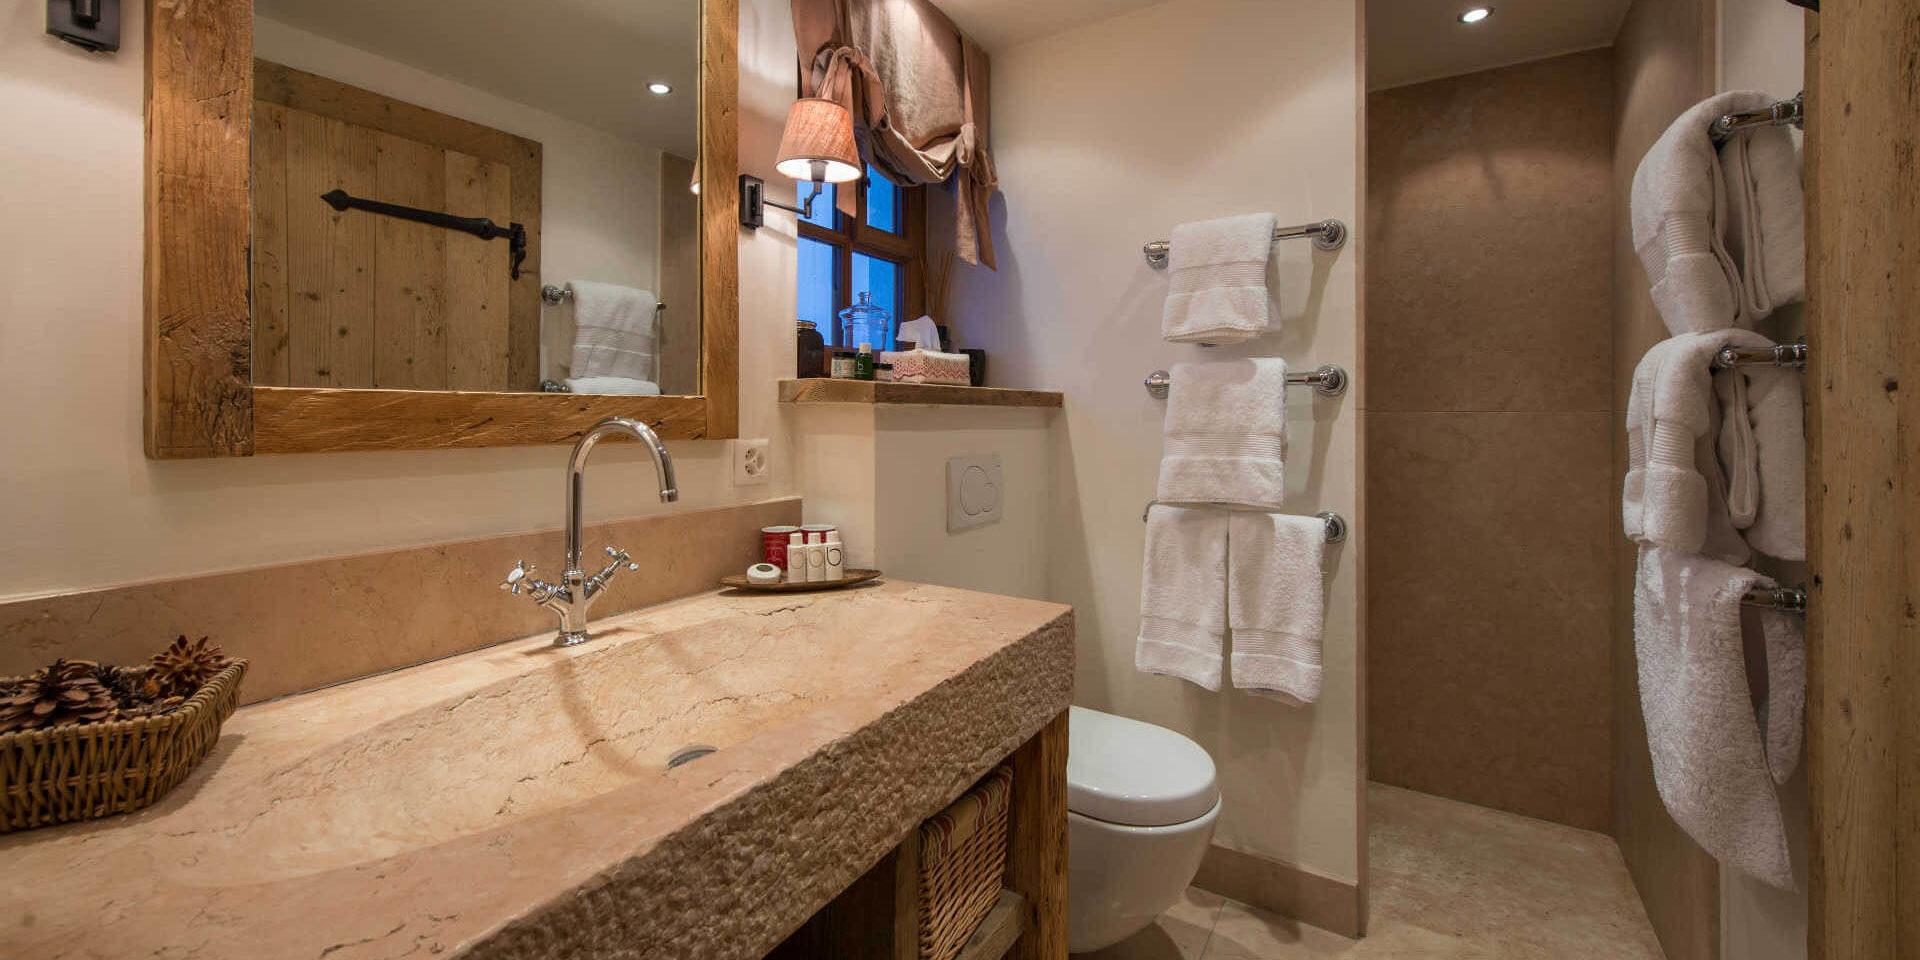 Chalet Nyumba Verbier Les 4 Vallees Zwitserland wintersport skivakantie luxe badkamer douche wastafel handdoeken spiegel Bamford Organic Bath & Body-producten